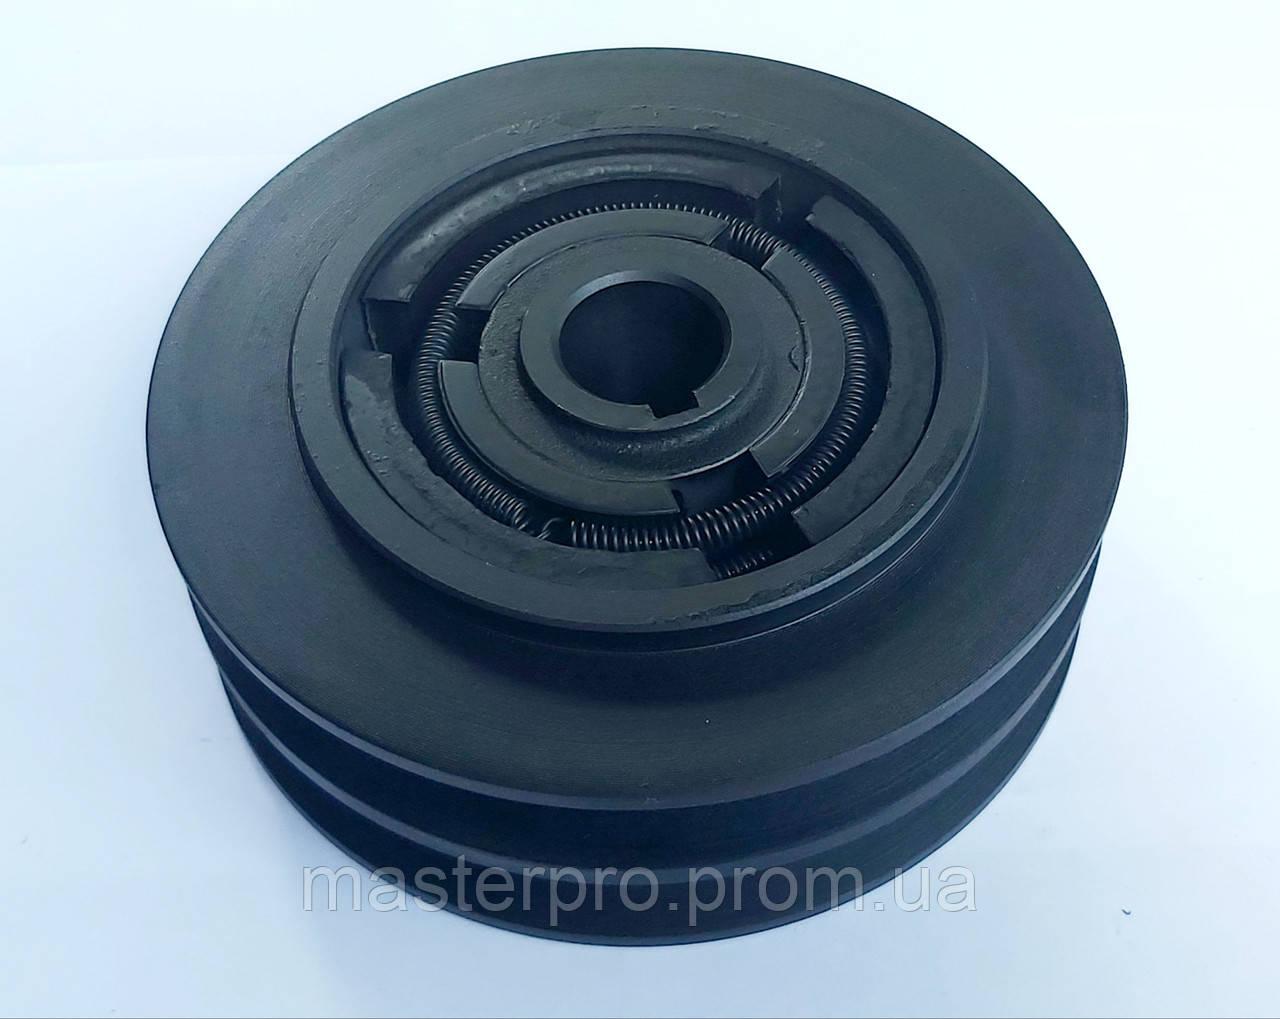 Центробежное сцепление на вал 22mm  диаметр 148mm 2 ручья А